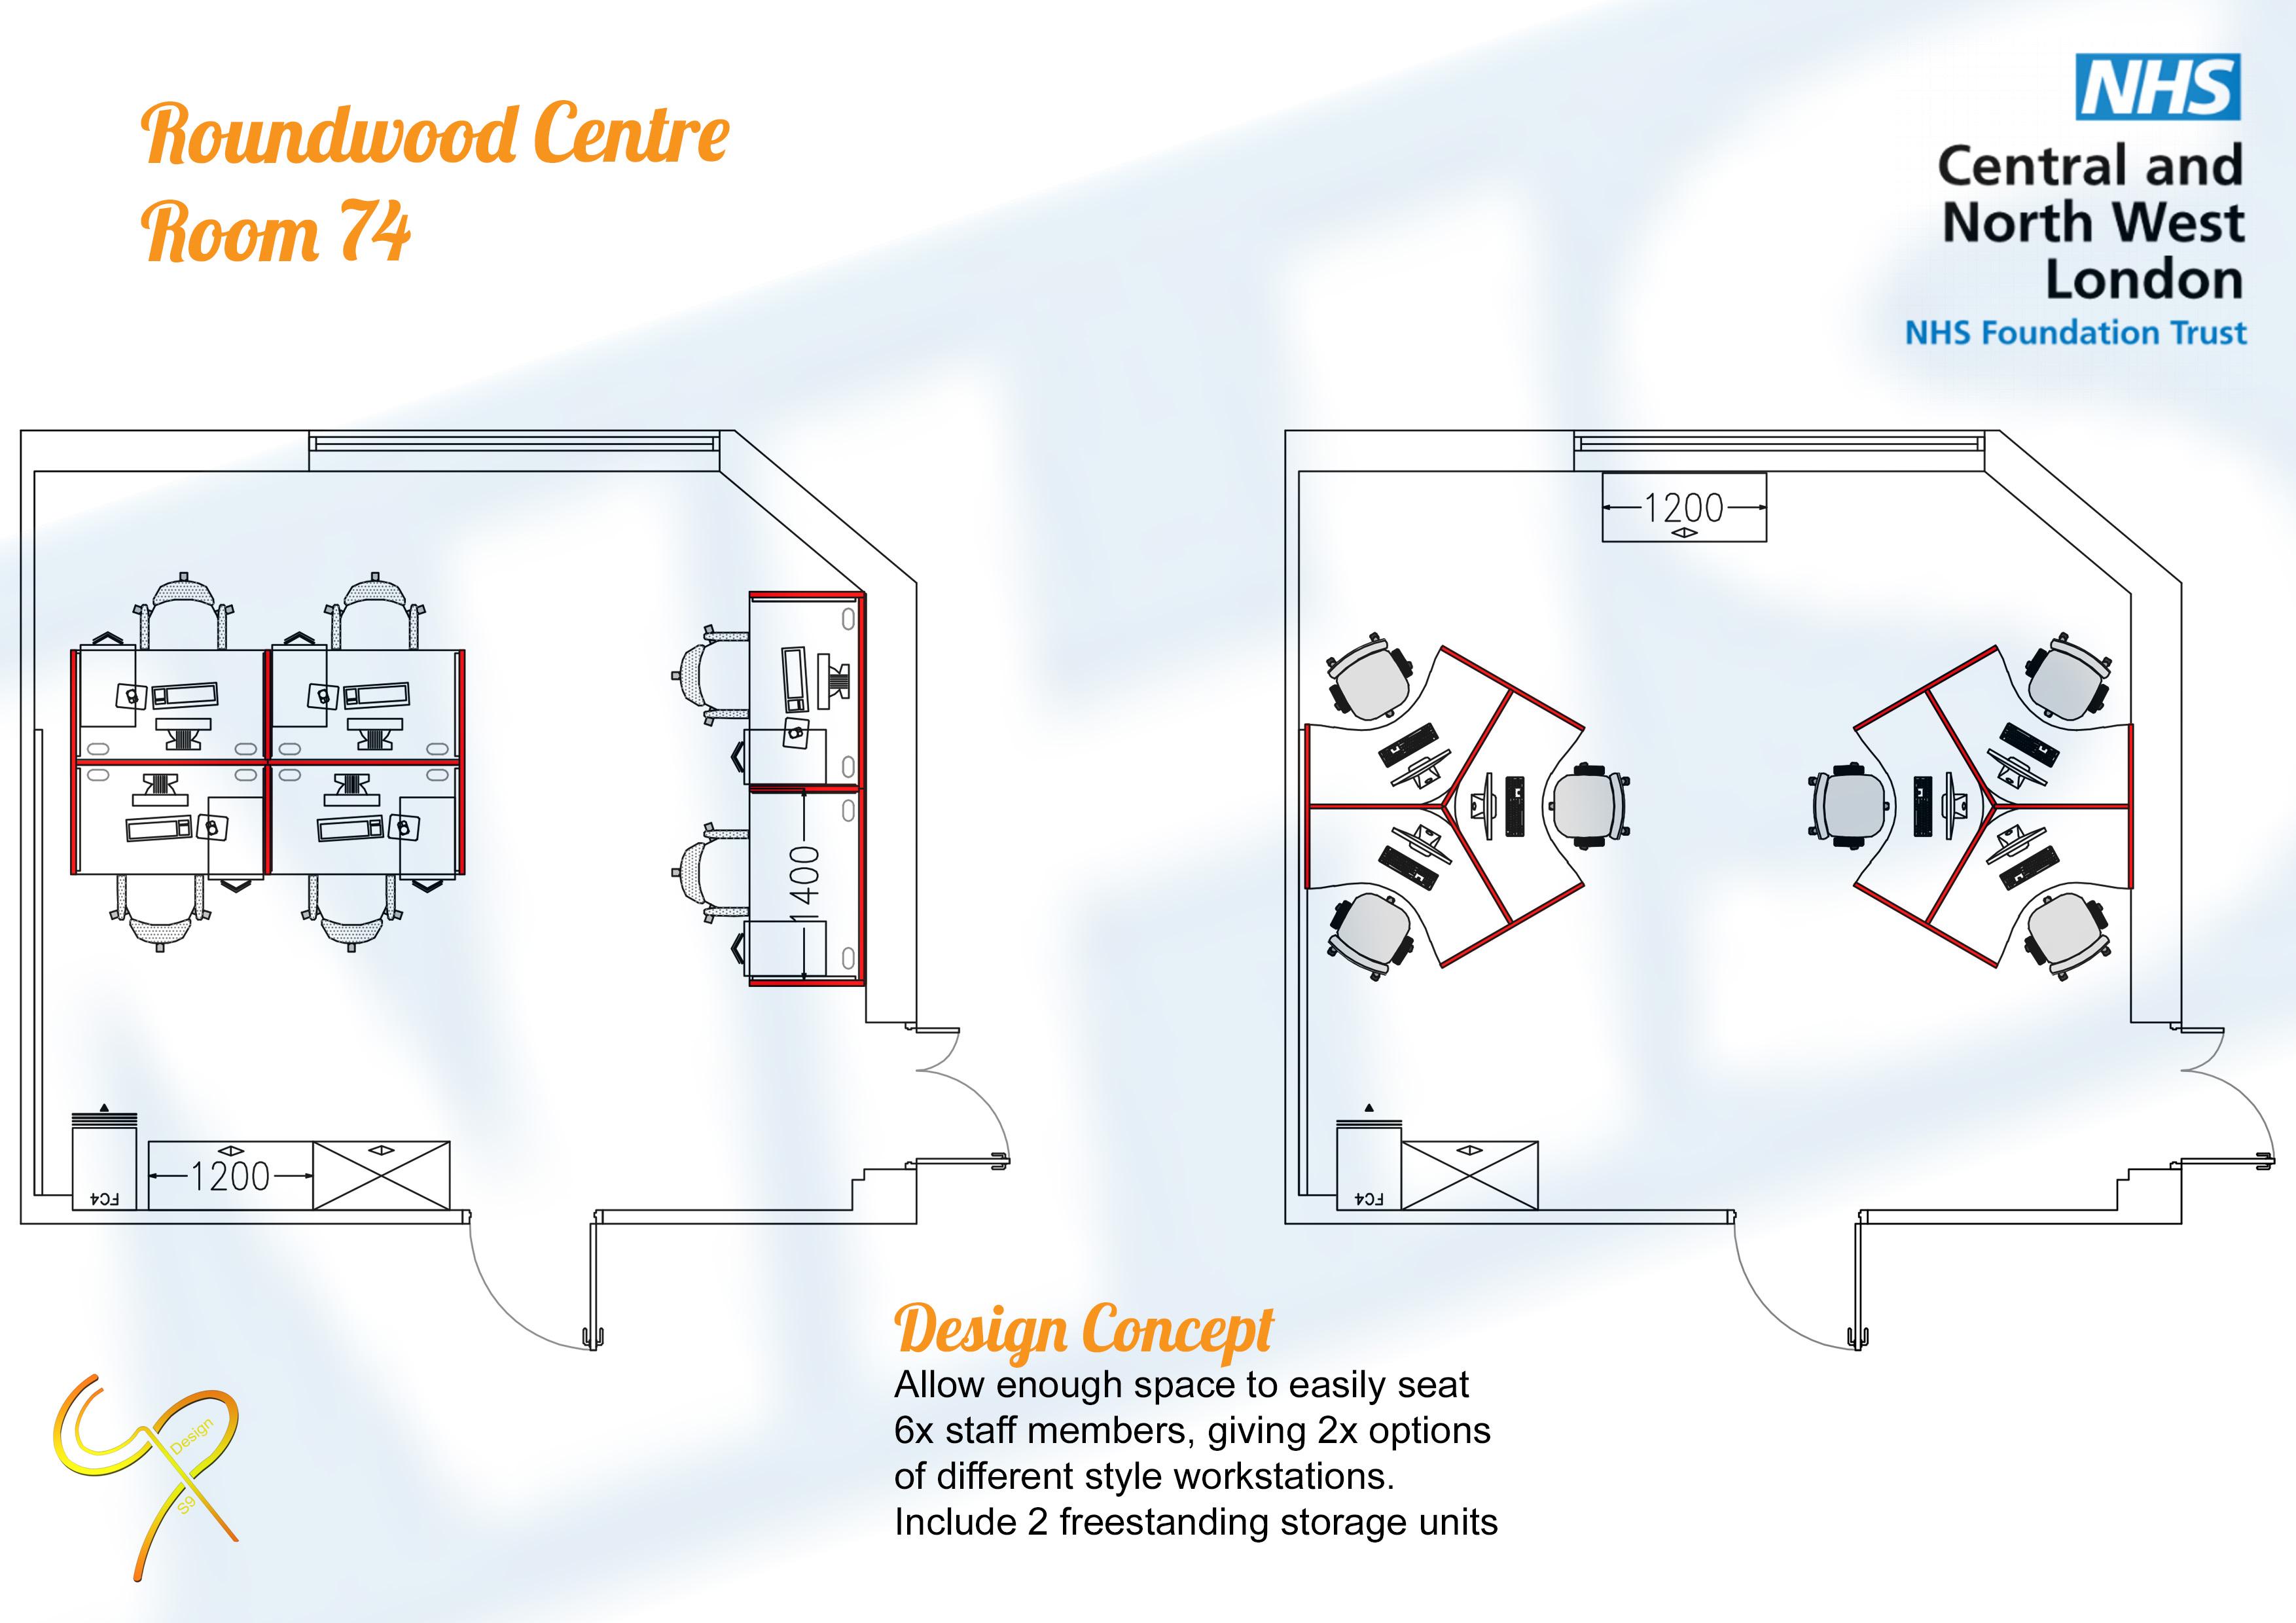 CNWL - Roundwood Centre, Room 74